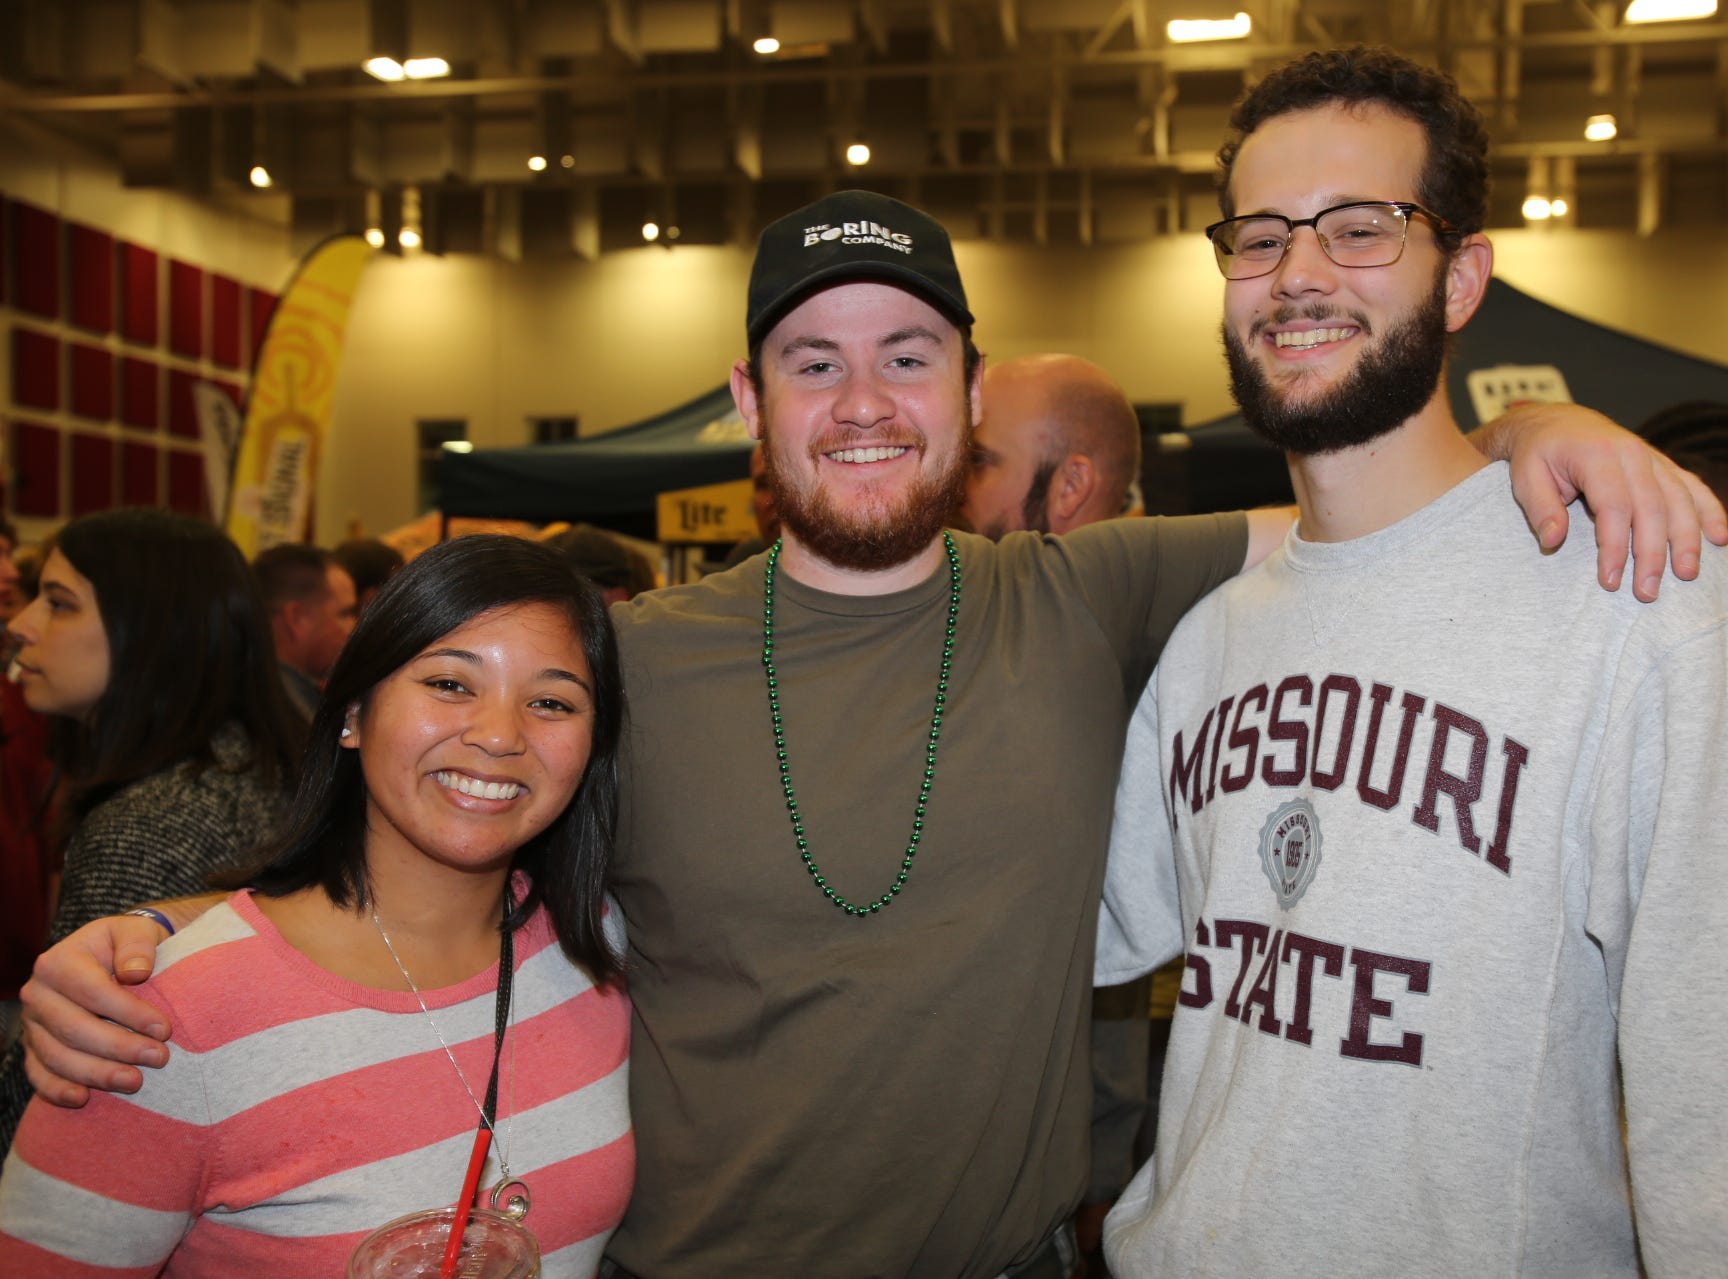 Regina Norris, Aiden Griffin, and Josh Hess